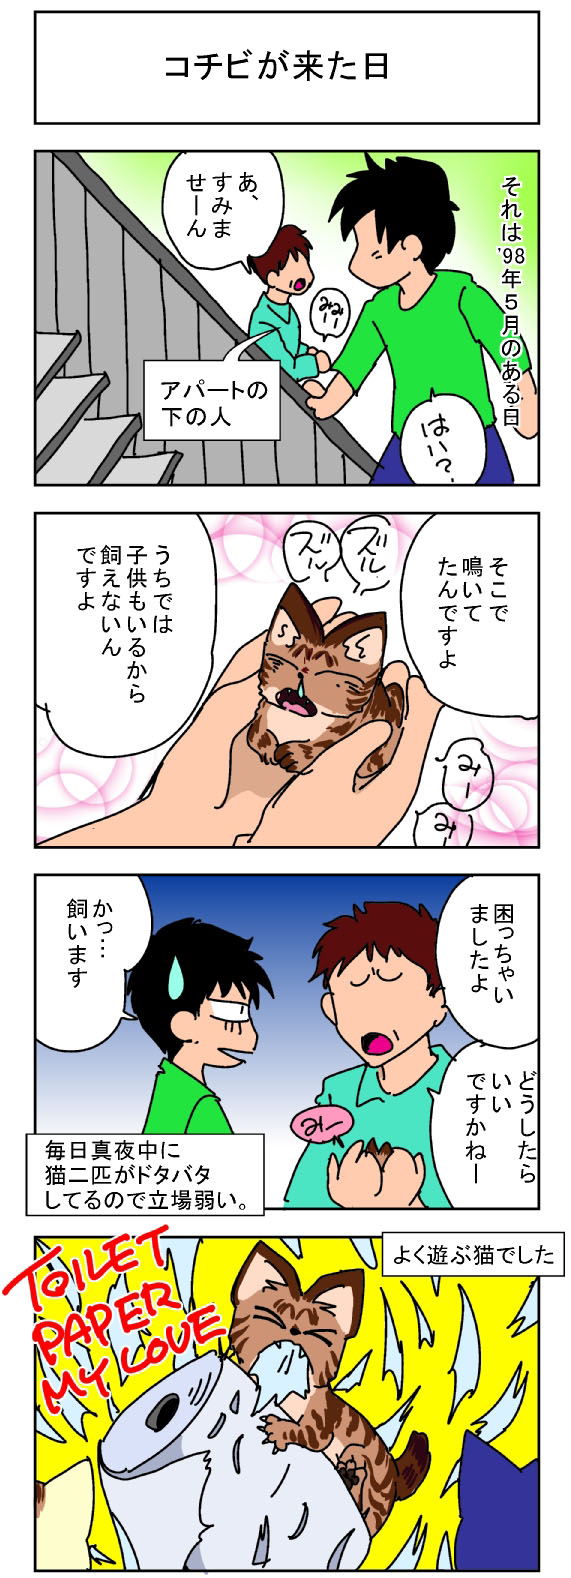 kochibi